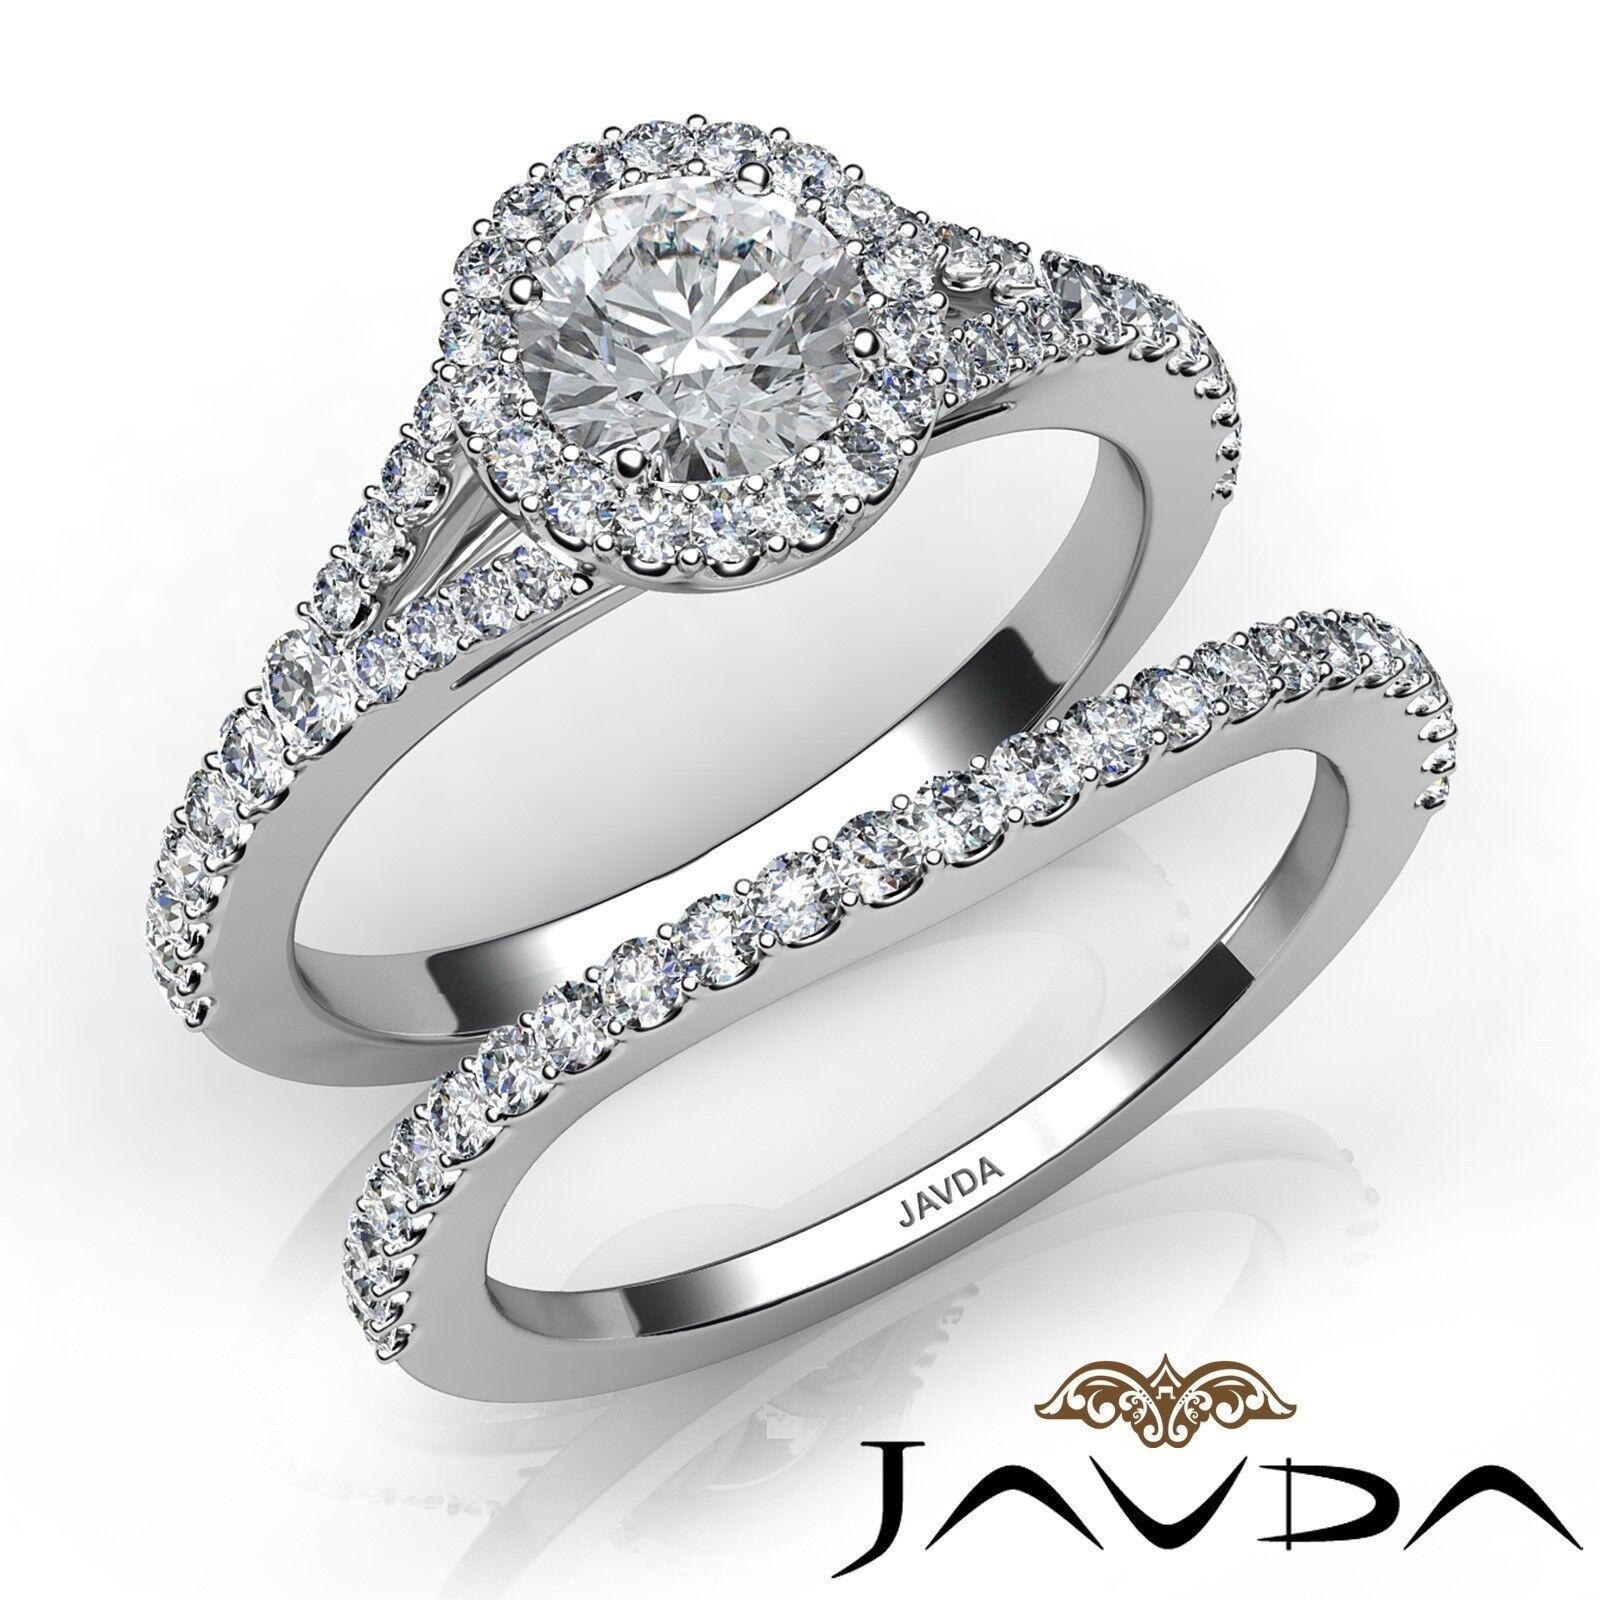 1.05ctw Floating Halo Bridal Set Round Diamond Engagement Ring GIA E-VS1 W Gold